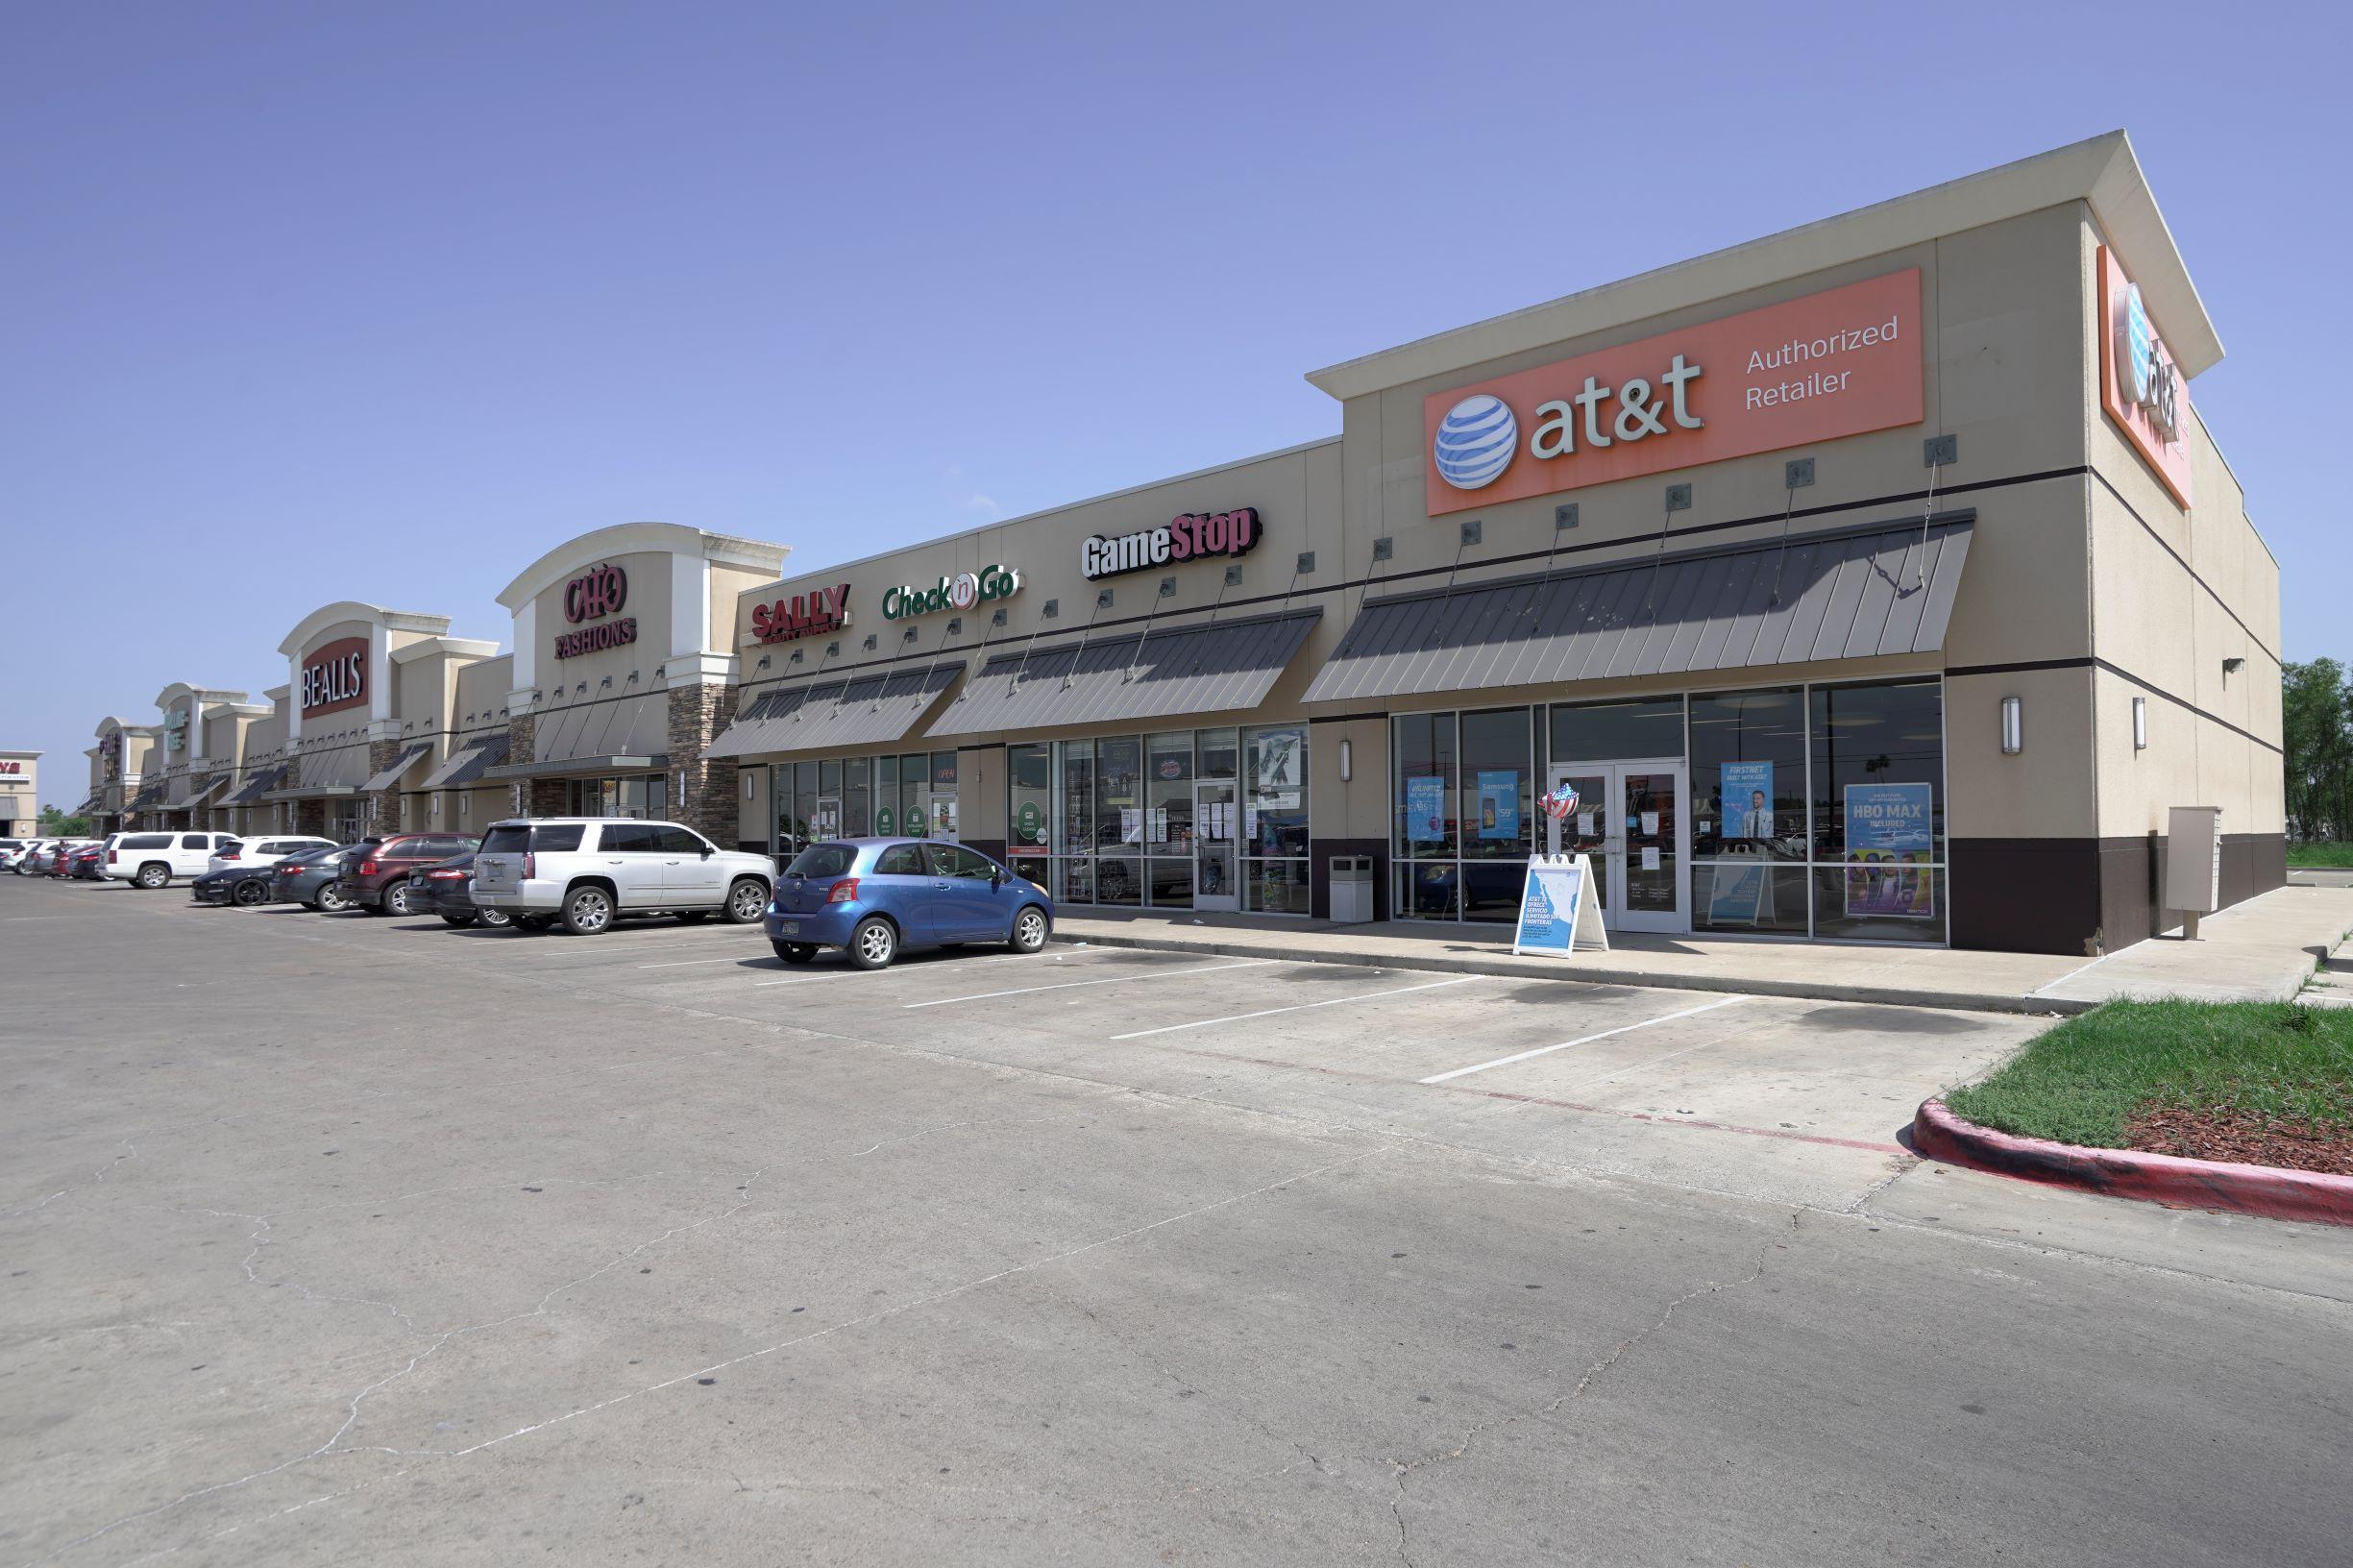 Walmart-anchored Strip